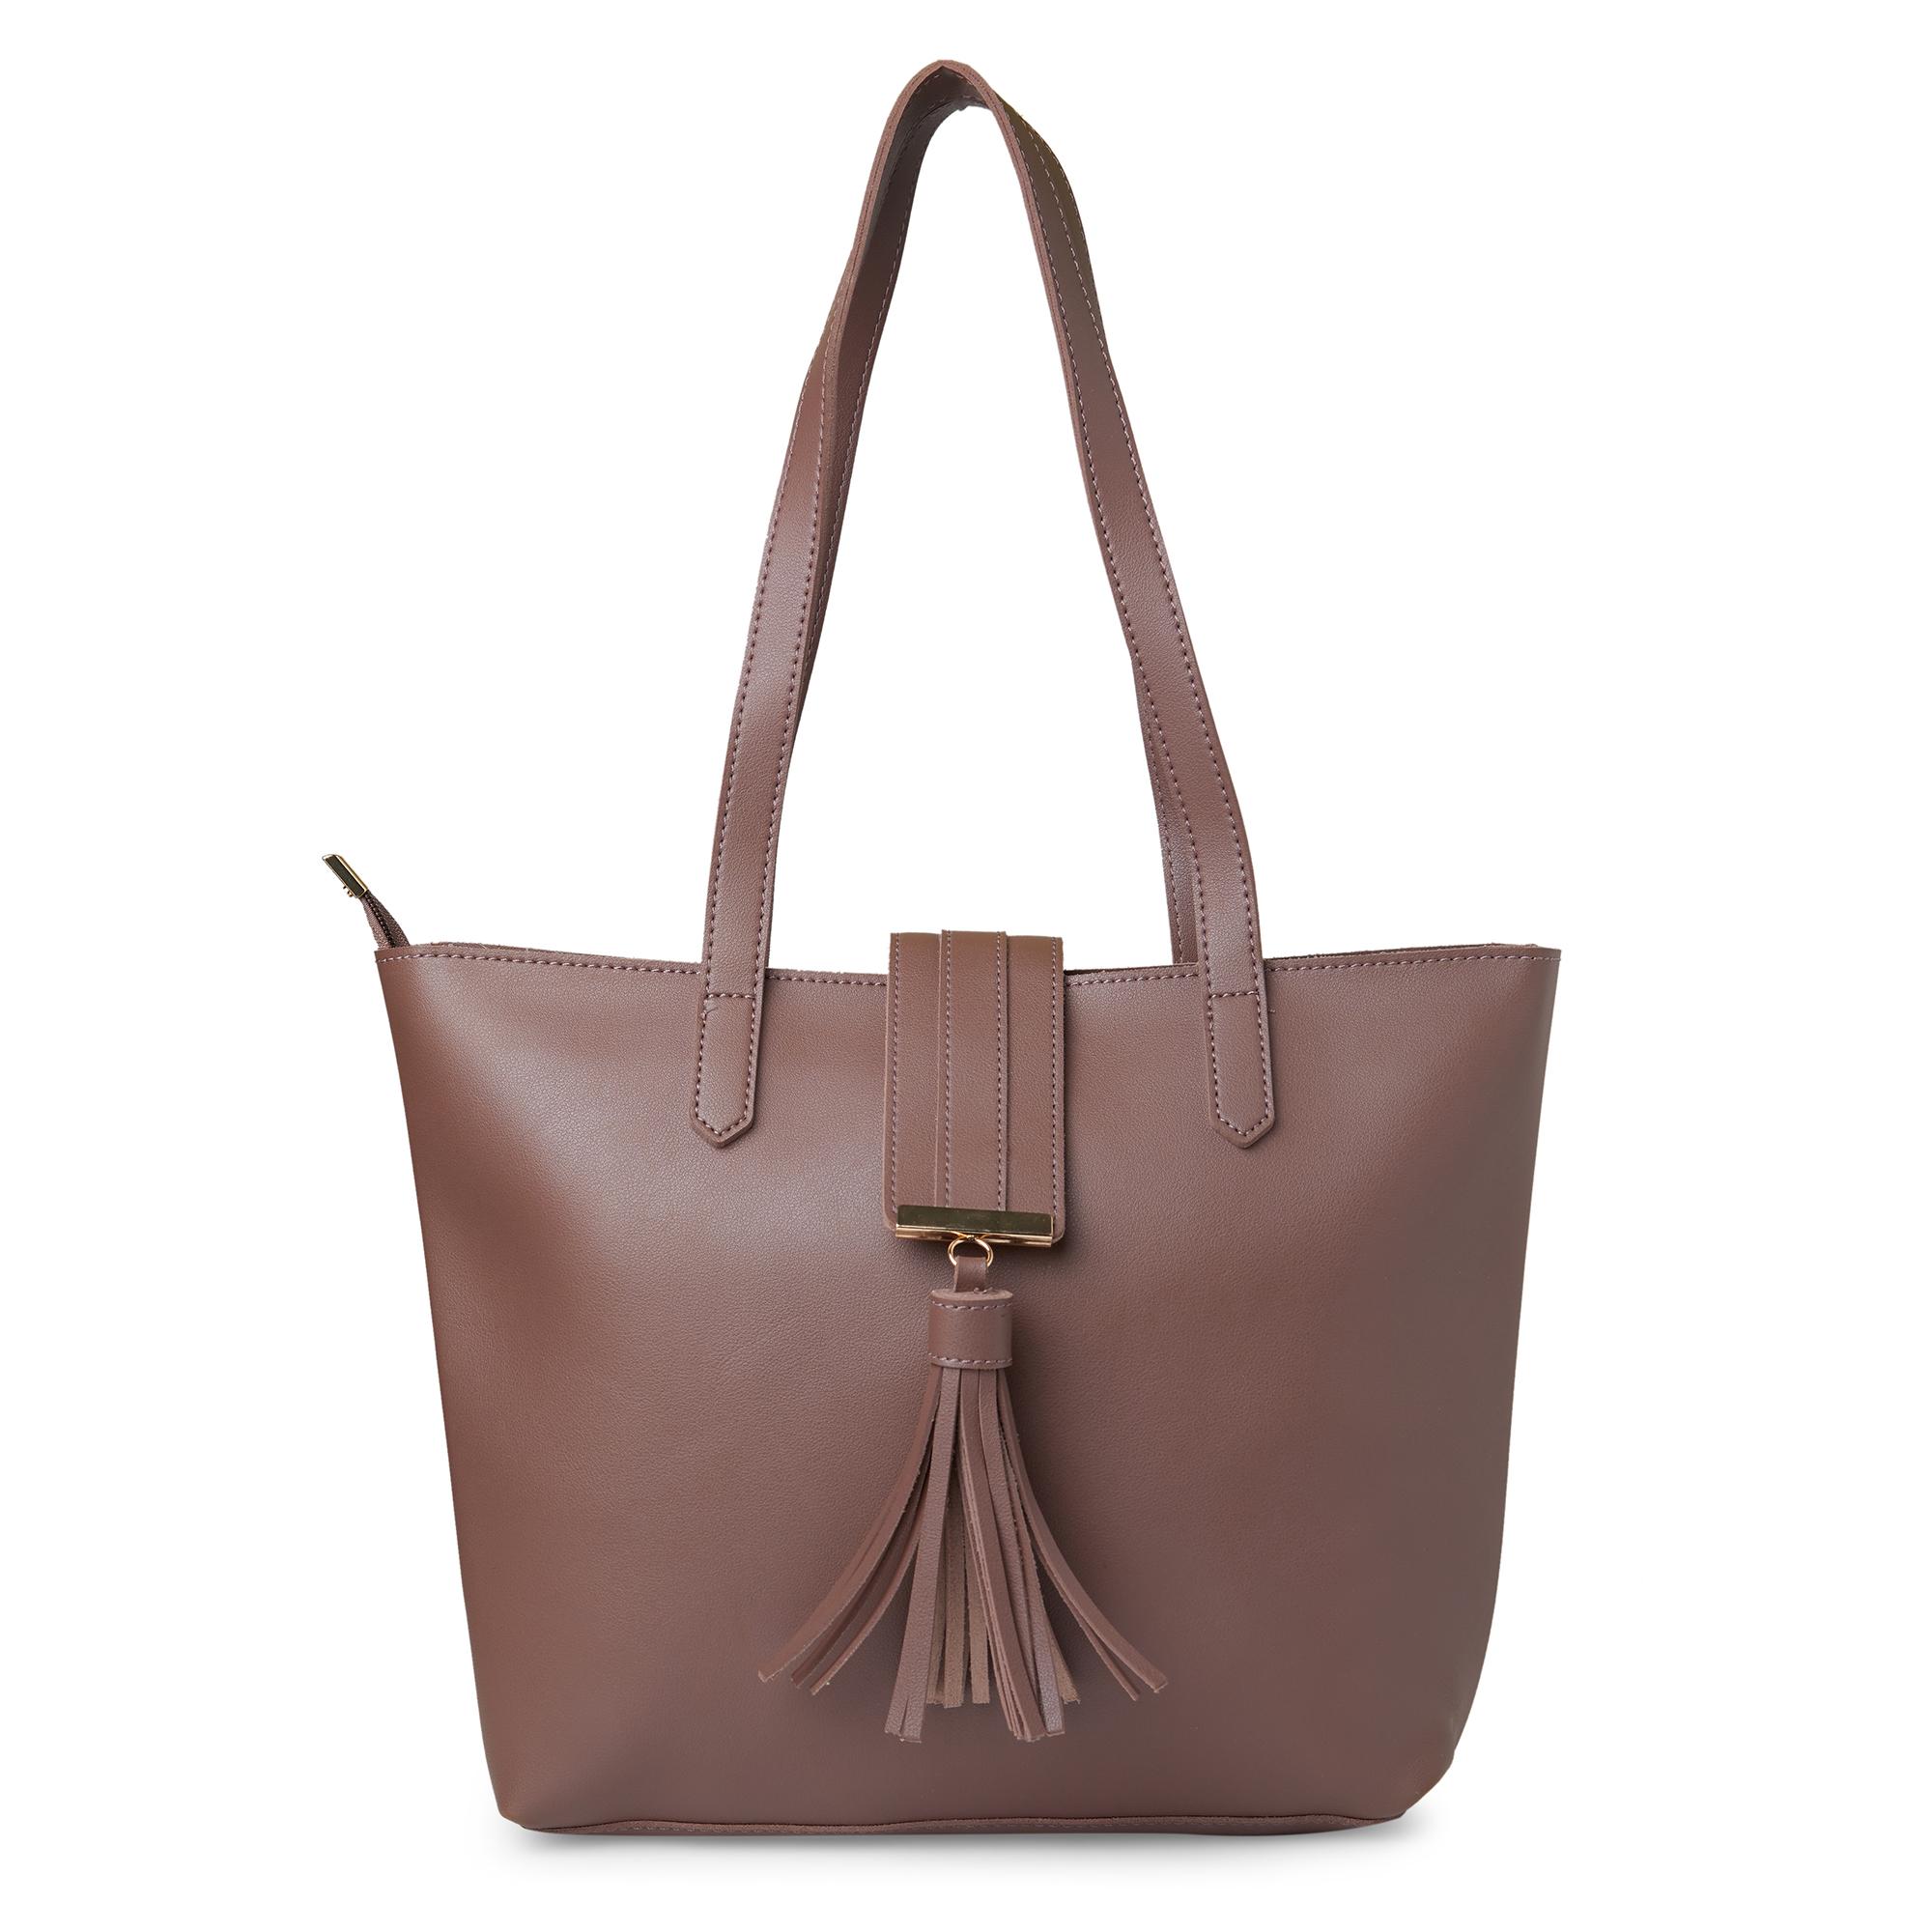 globus   Globus Dark Taupe Shopper Bag